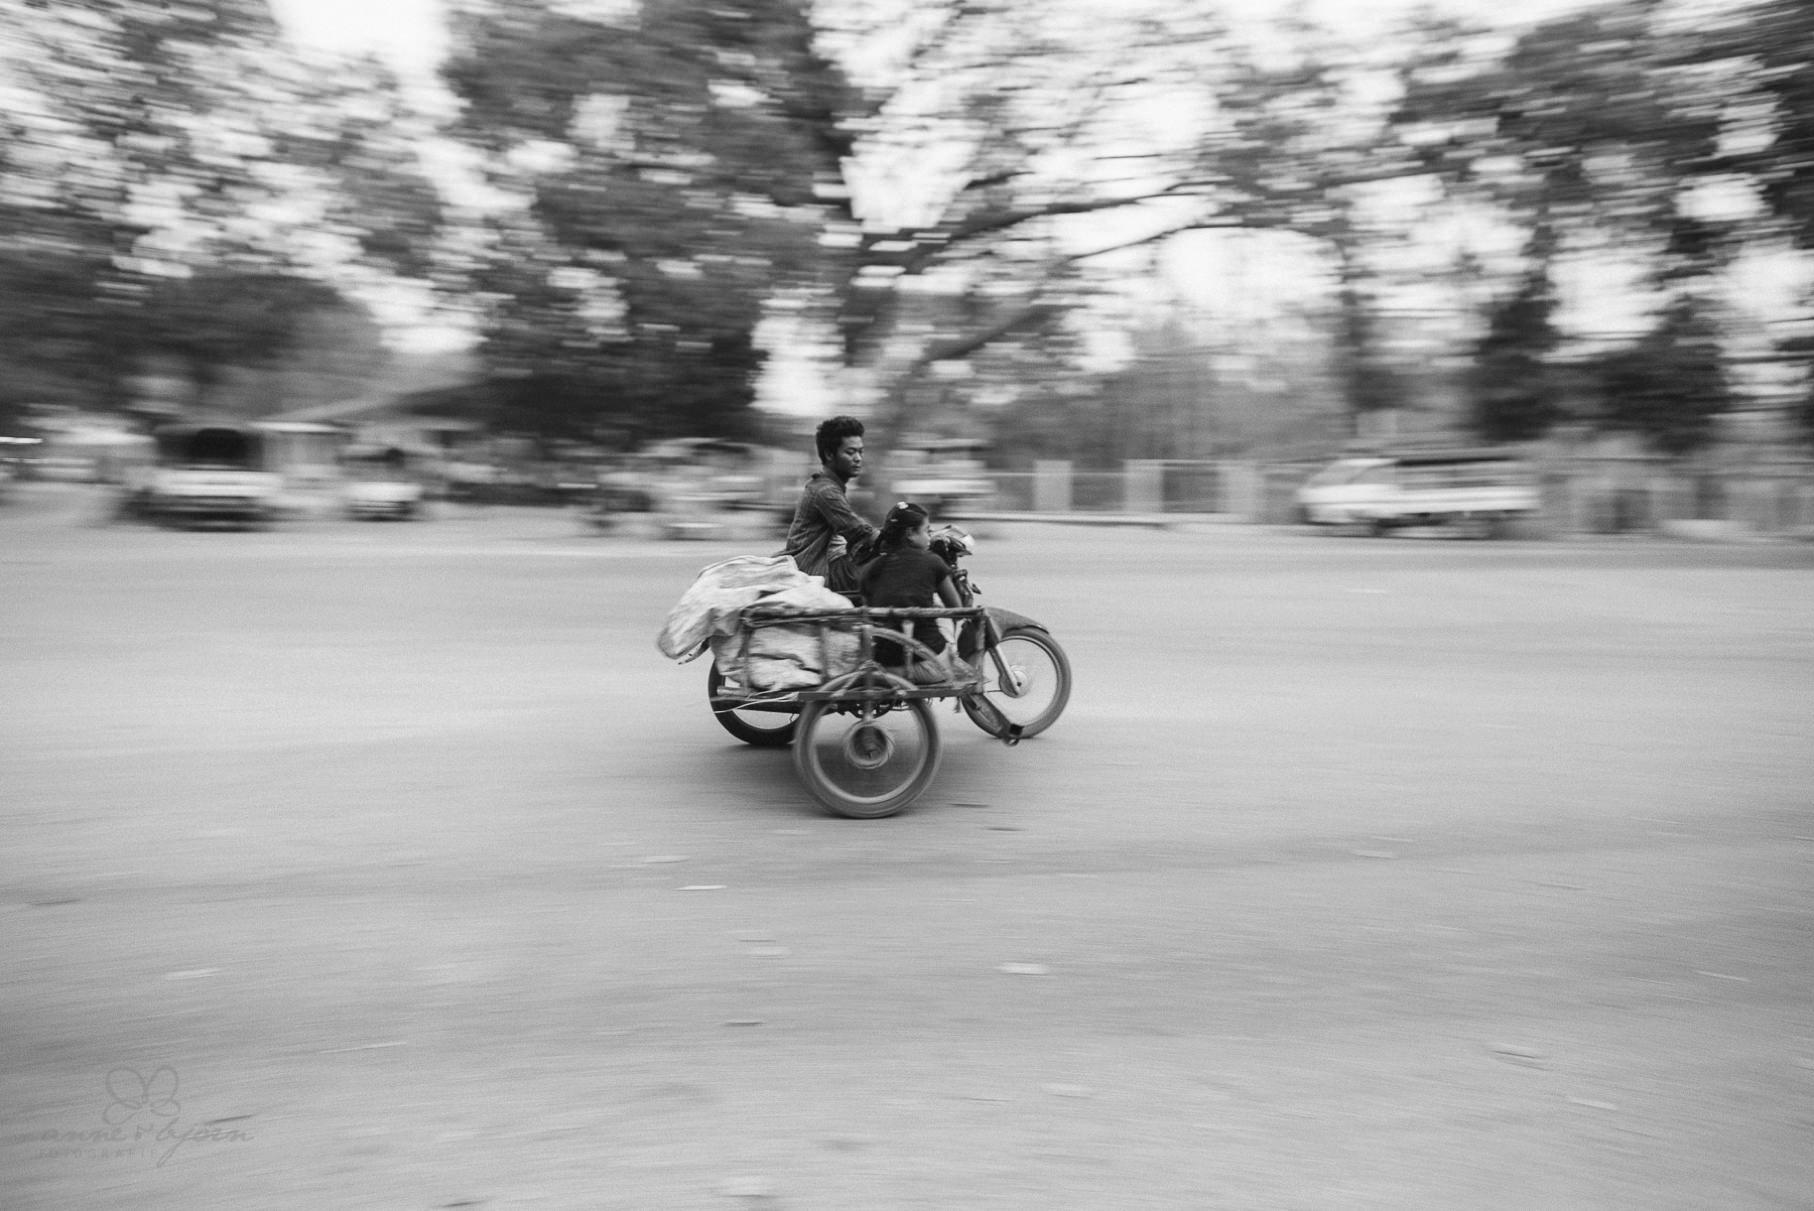 0060 yangon mandalay d76 7165 - Großstädte Myanmars - Yangon & Mandalay